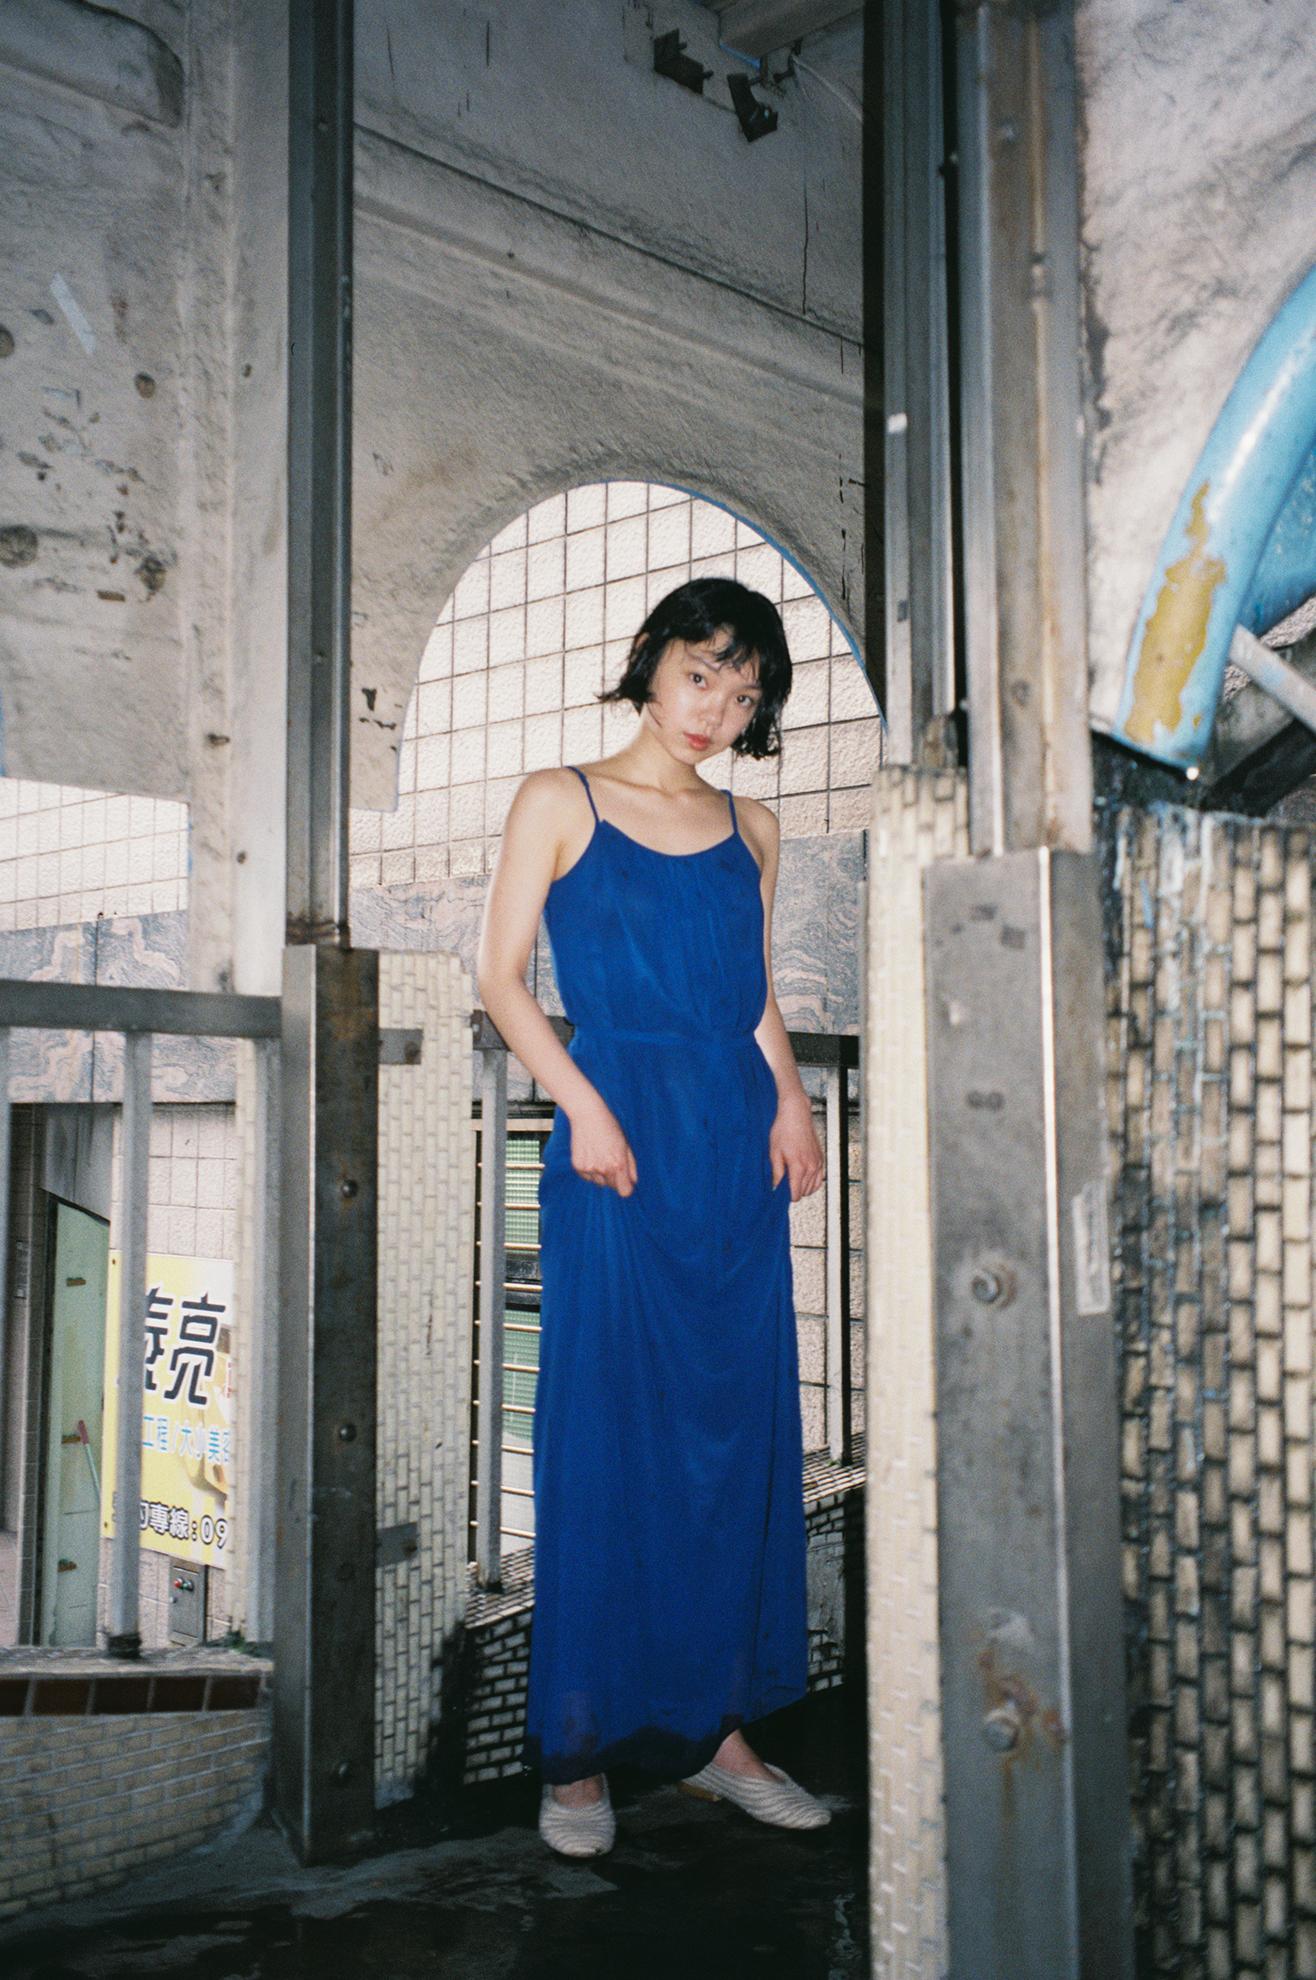 古川琴音の画像 p1_17